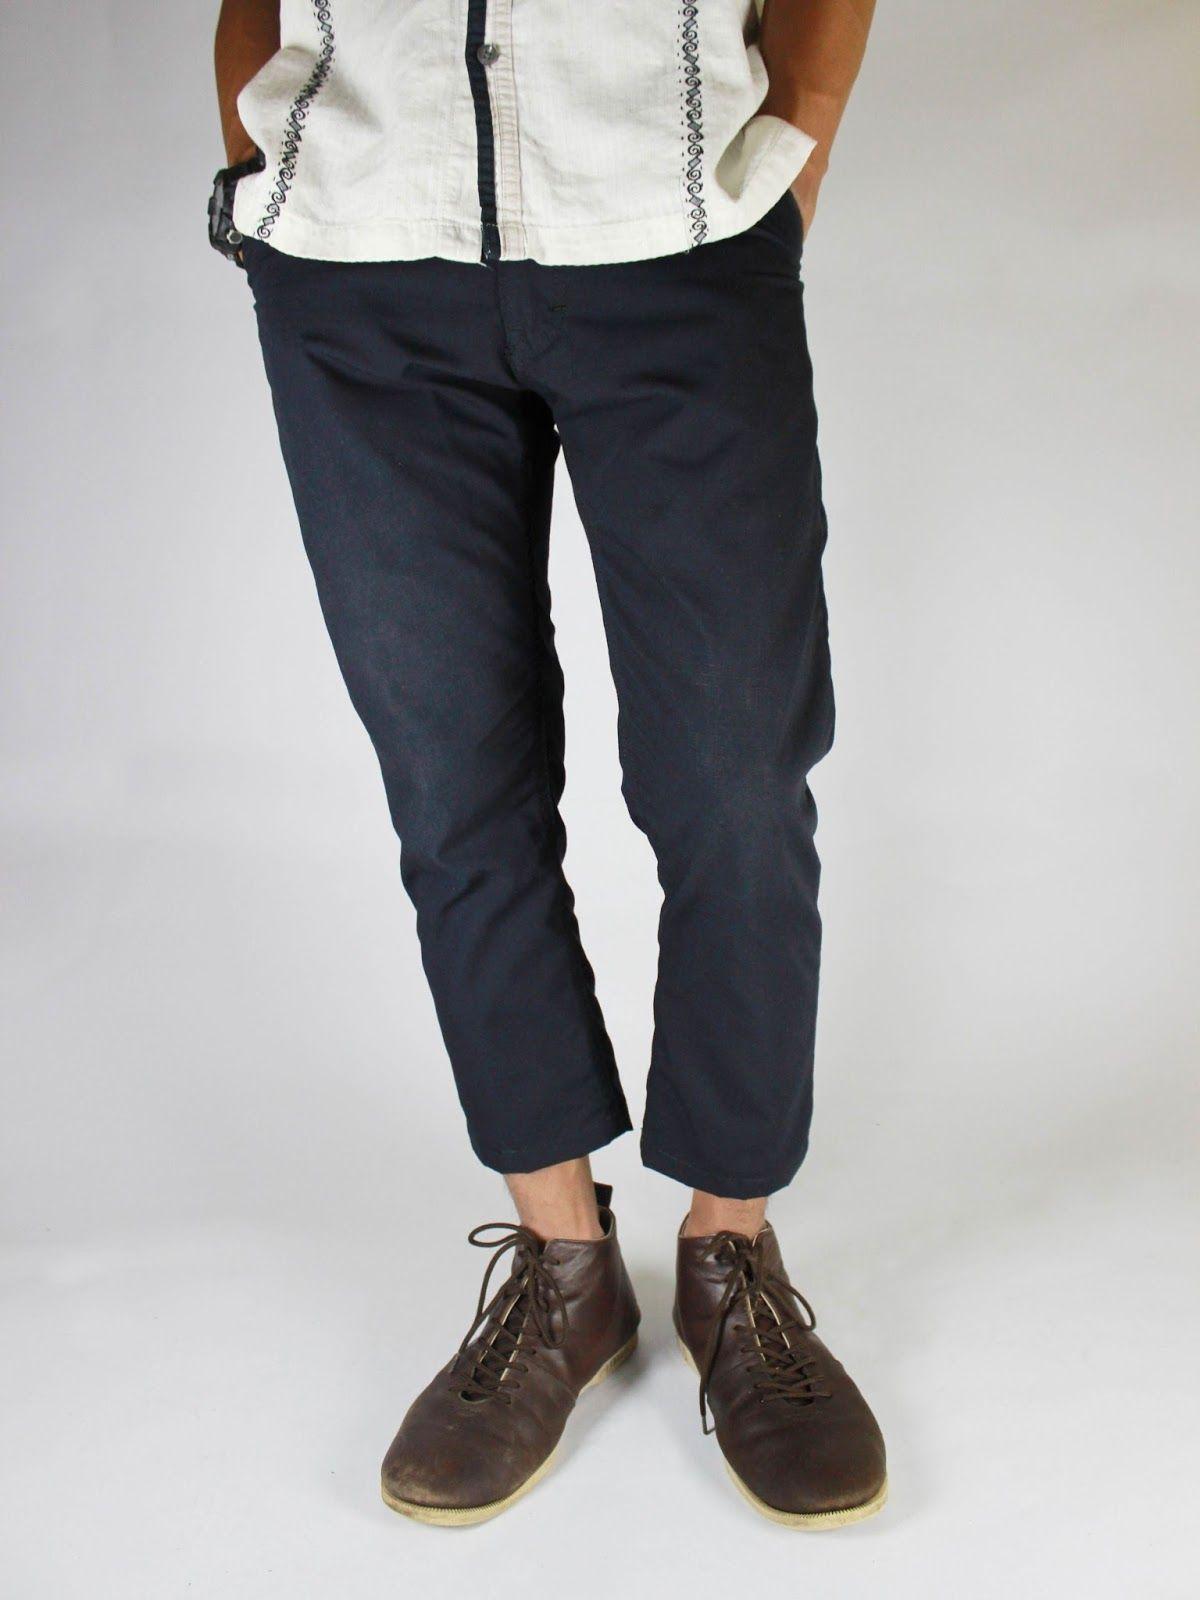 Celana Basic Navy Spec Dan Daftar Harga Terbaru Indonesia Emba Jeans Fm328 Upd Warna Heavy Stom 27 Cingkrang Laisbal Blue